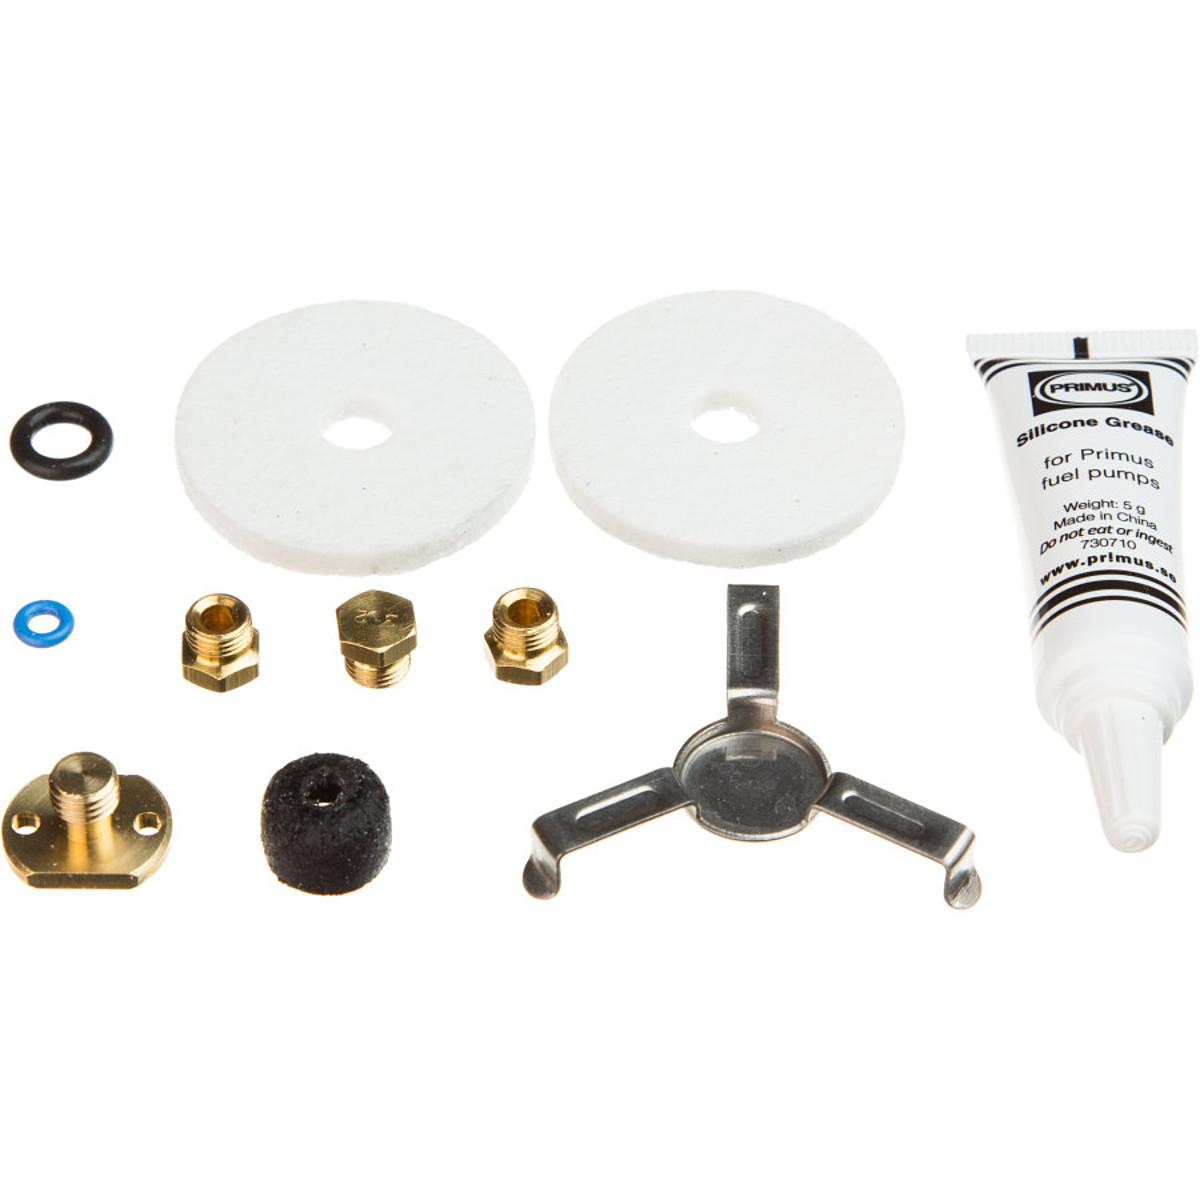 Primus OmniLite TI Maintenance Kit